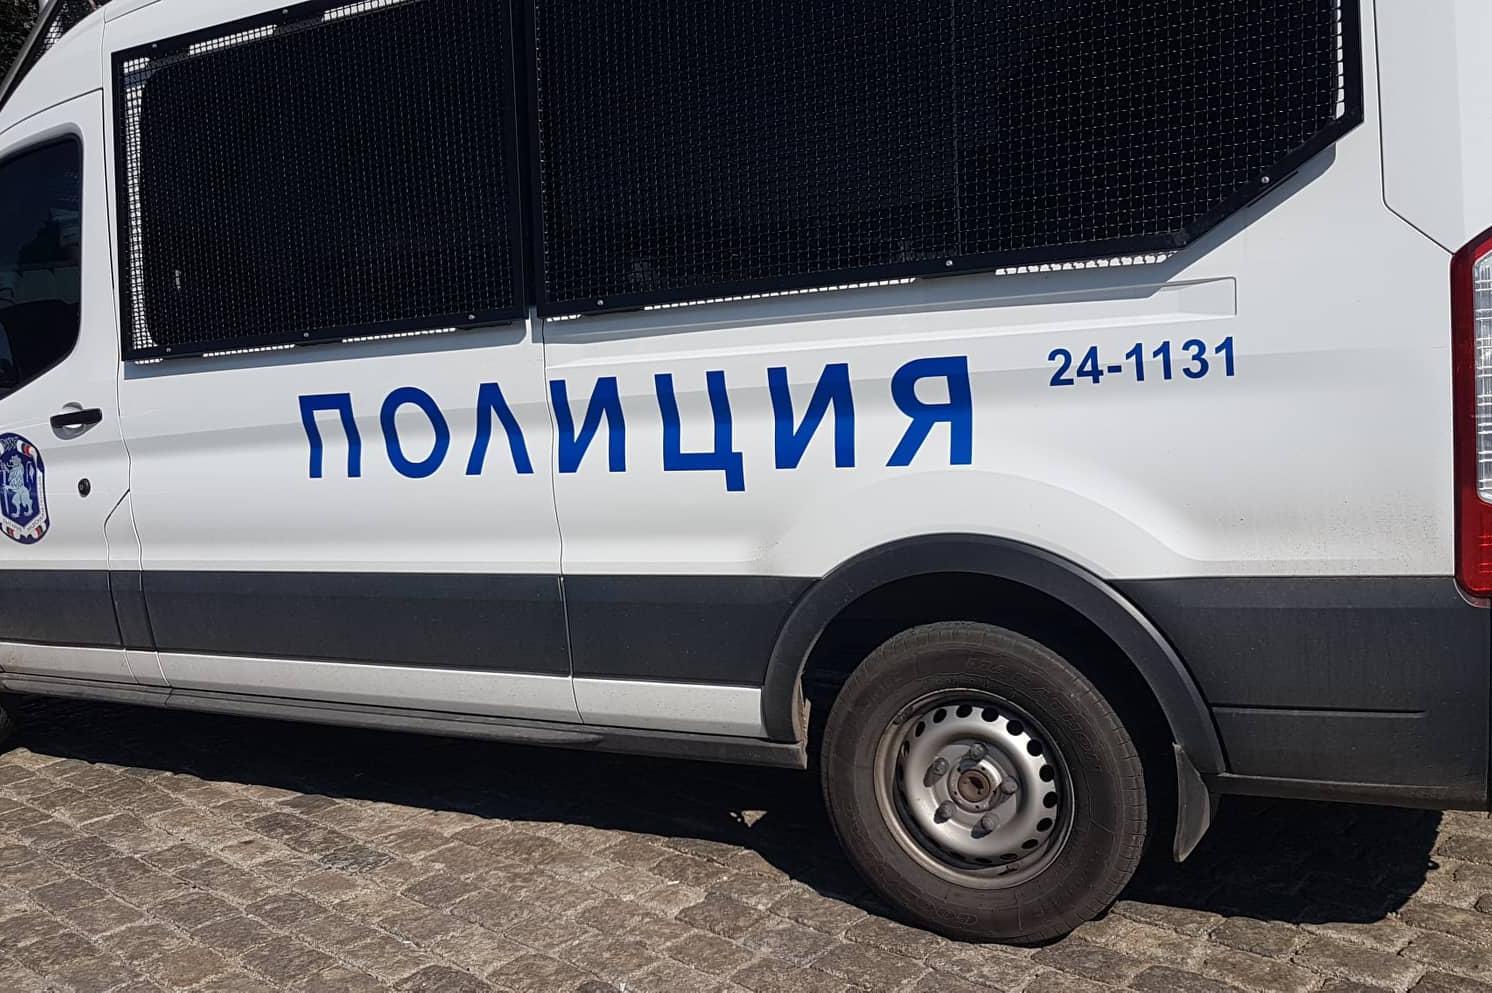 В блок в София: Откриха труп на мъж близо месец след смъртта му